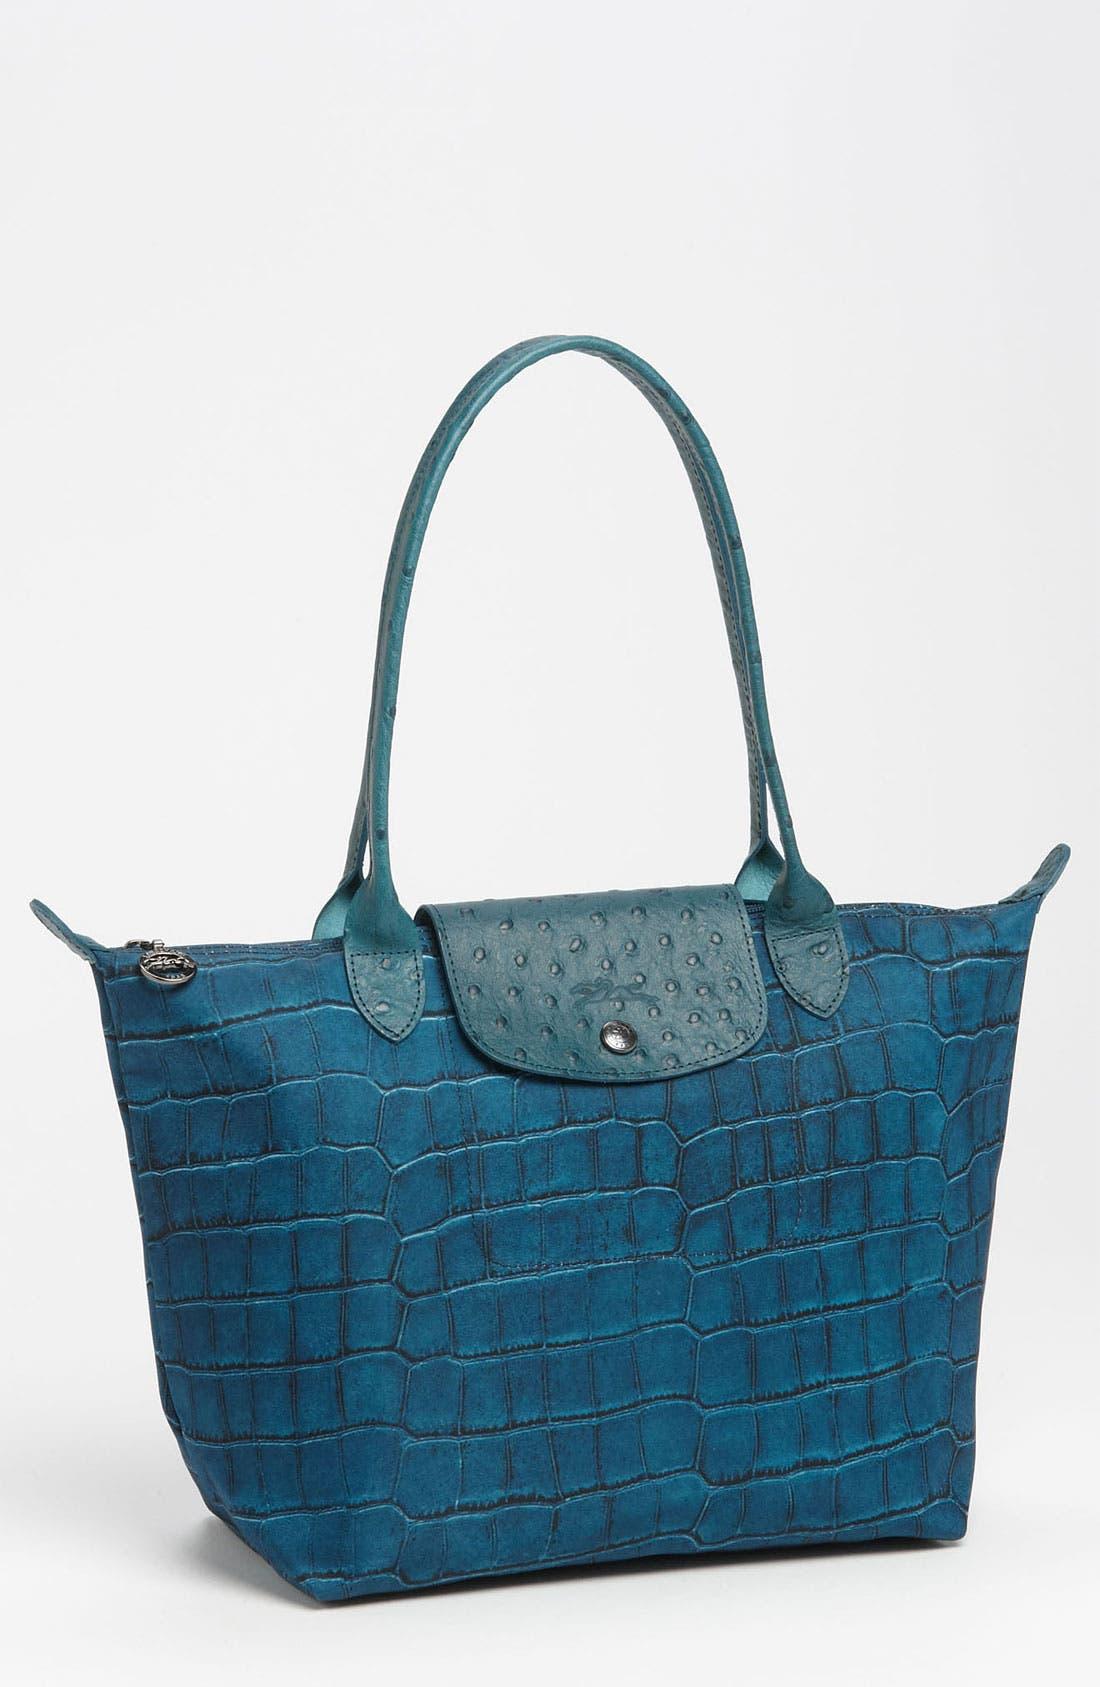 Main Image - Longchamp 'Le Pliage Croco' Small Shoulder Tote